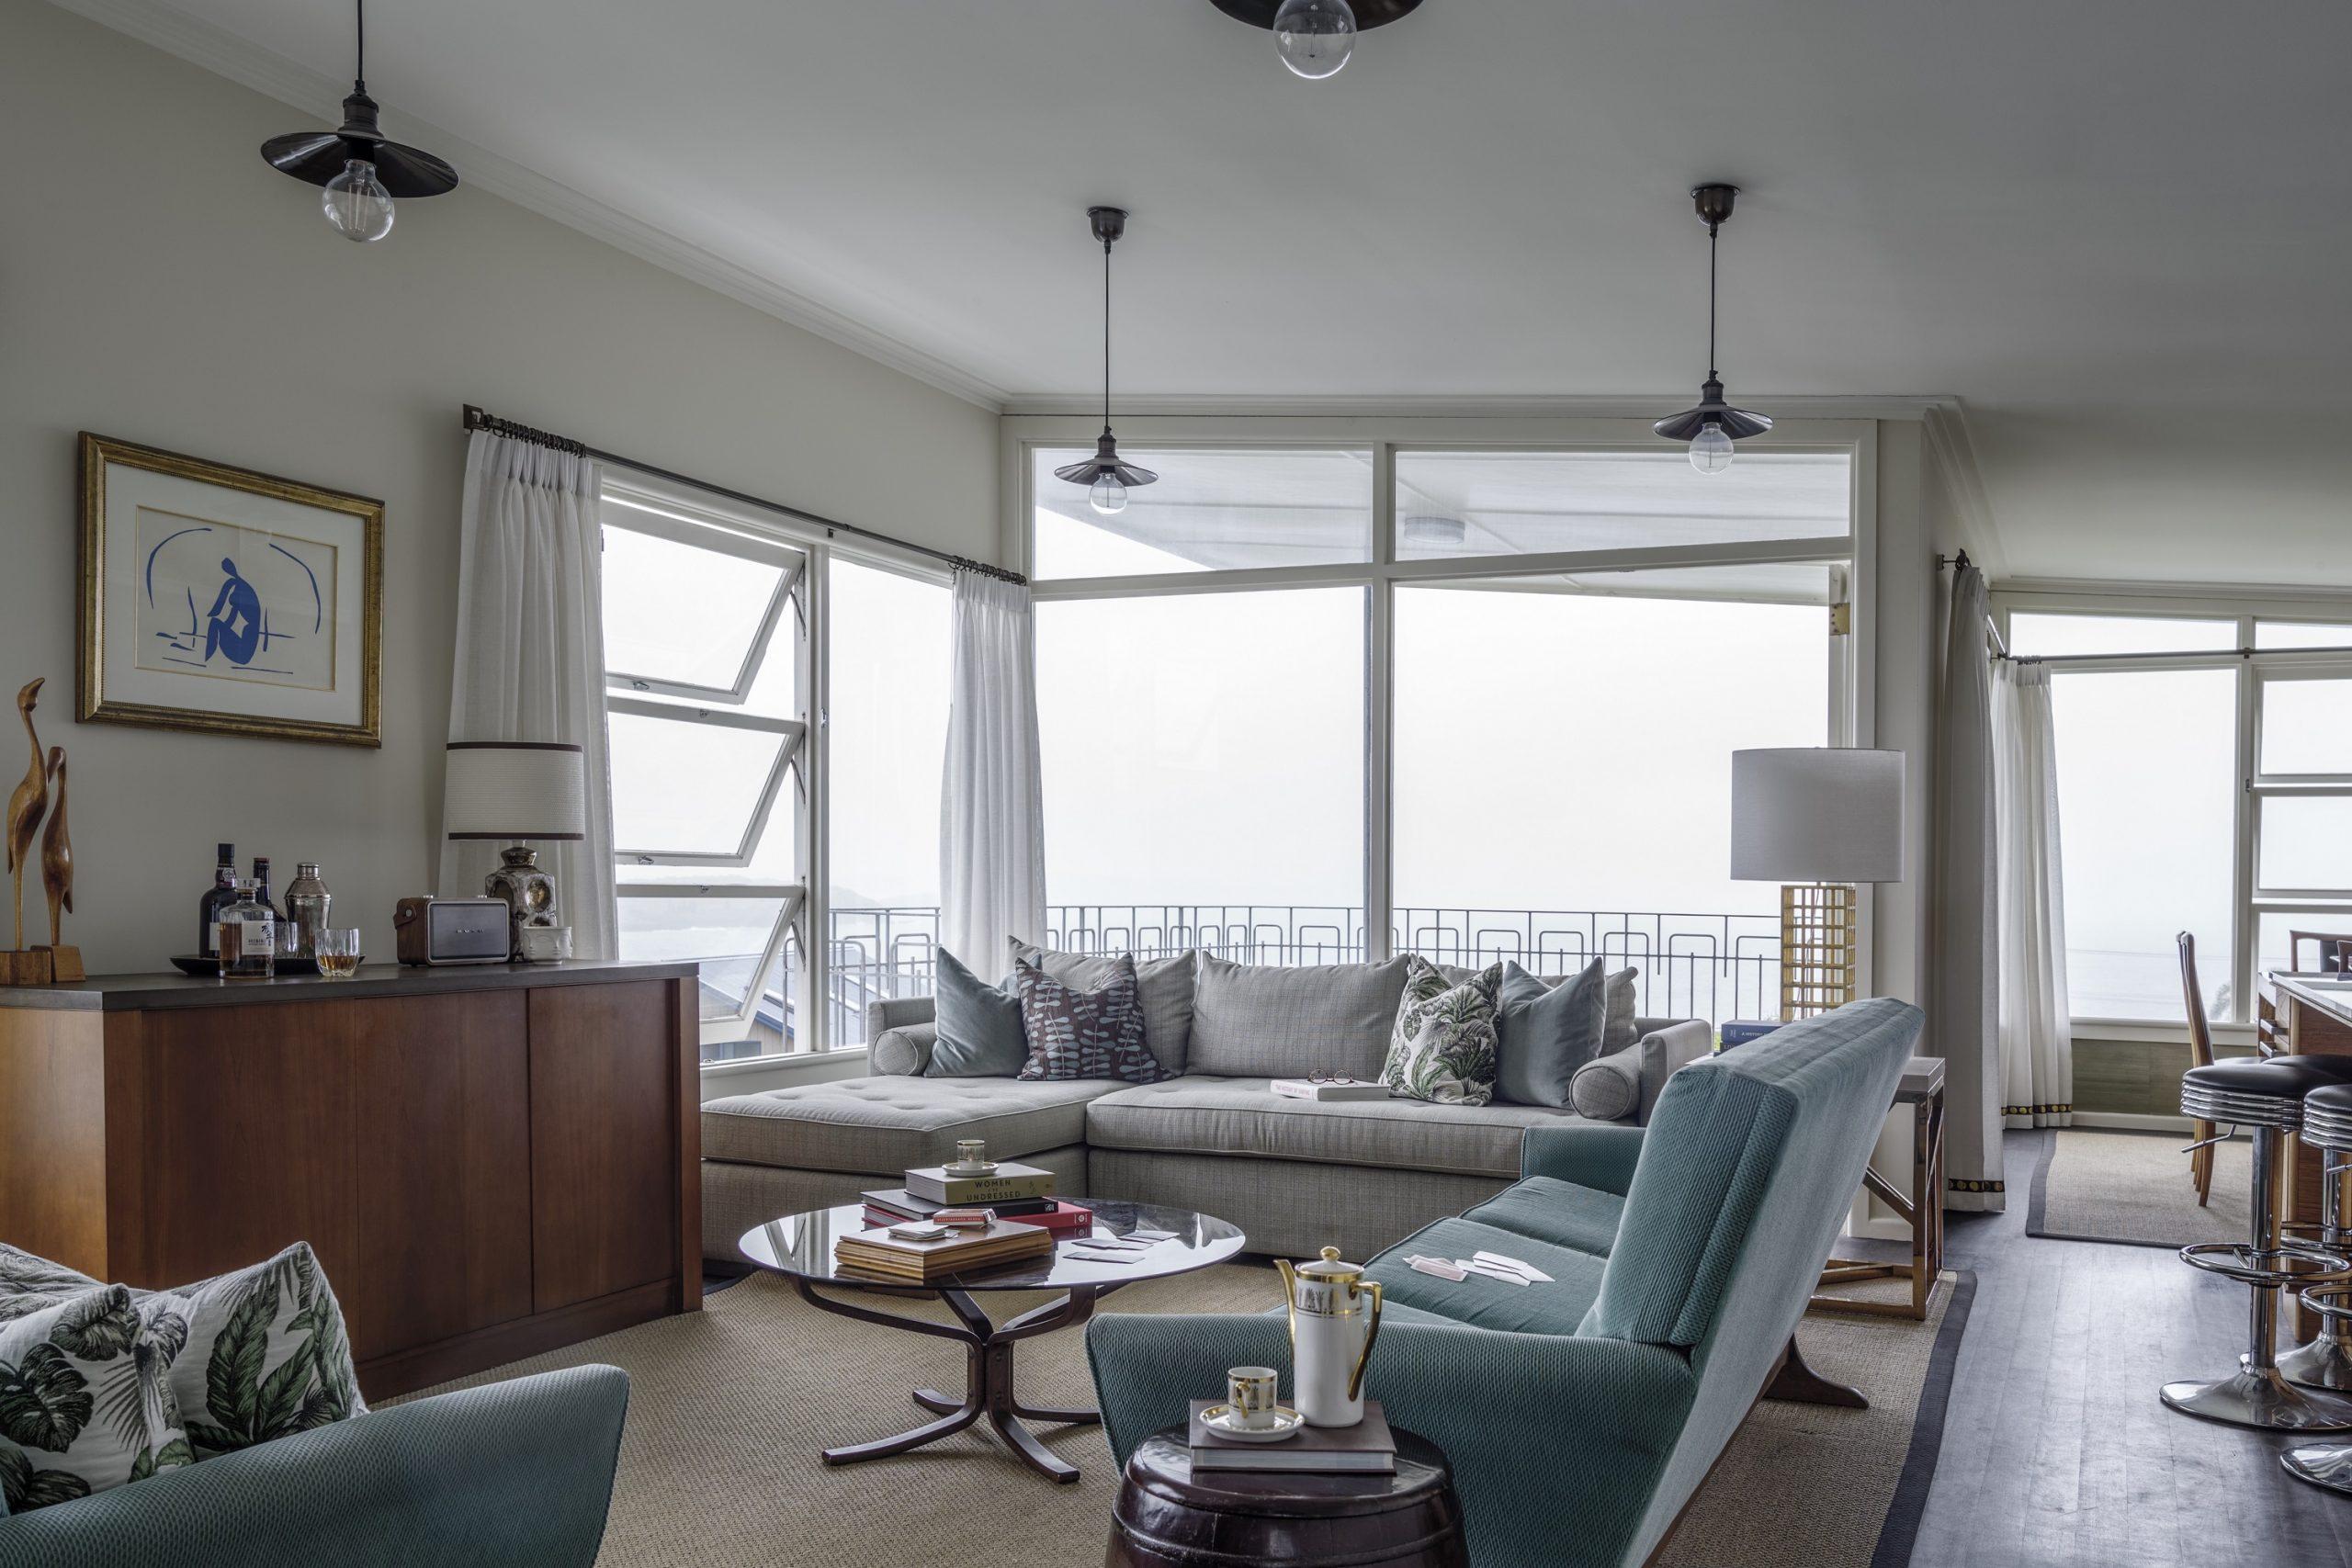 Retro-Couch-Interior-Design-1970s-Living-Kiama-Michael-Bell-Architects-Sydney